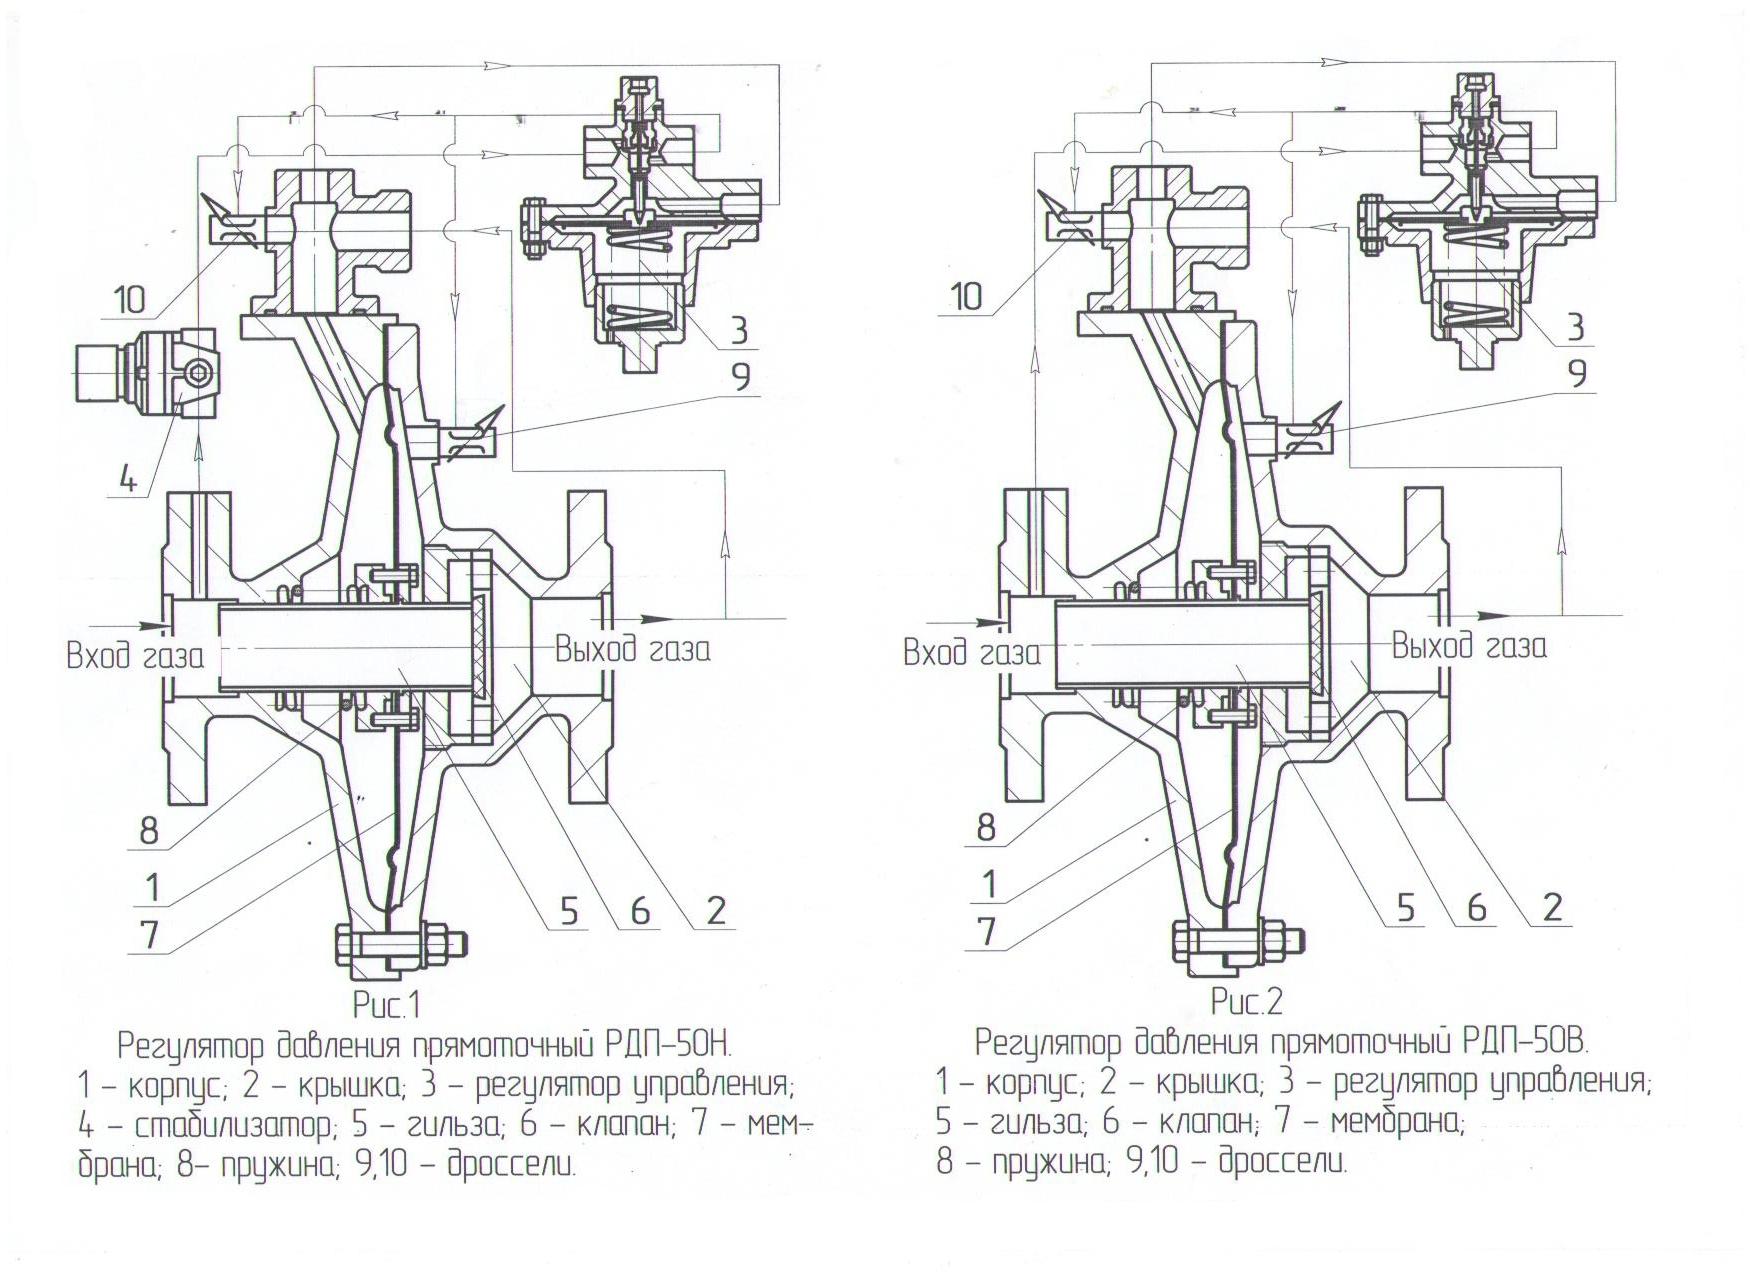 Мембрана стабилизатора к РДП-50Н